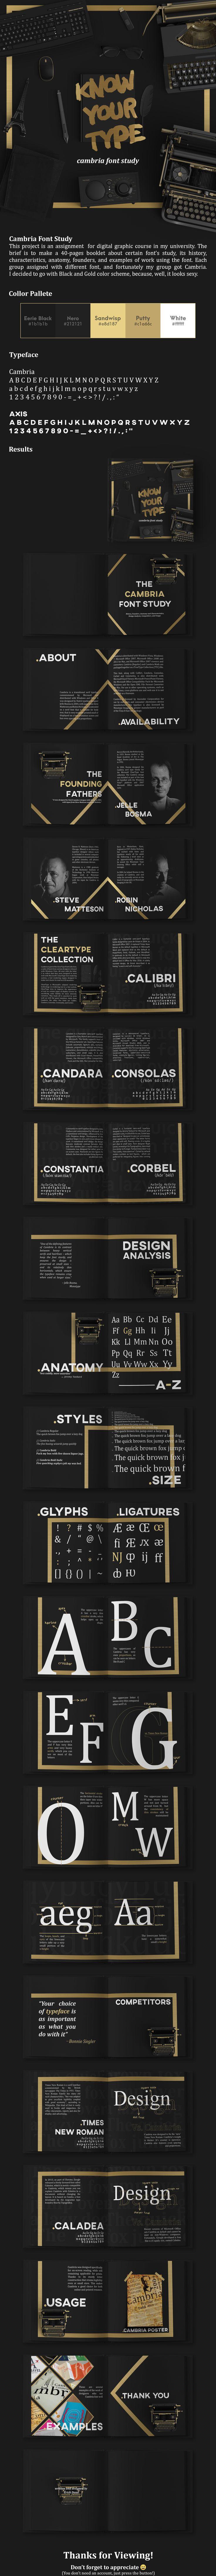 Best 25+ Cambria font ideas on Pinterest | Font combinations, Font ...